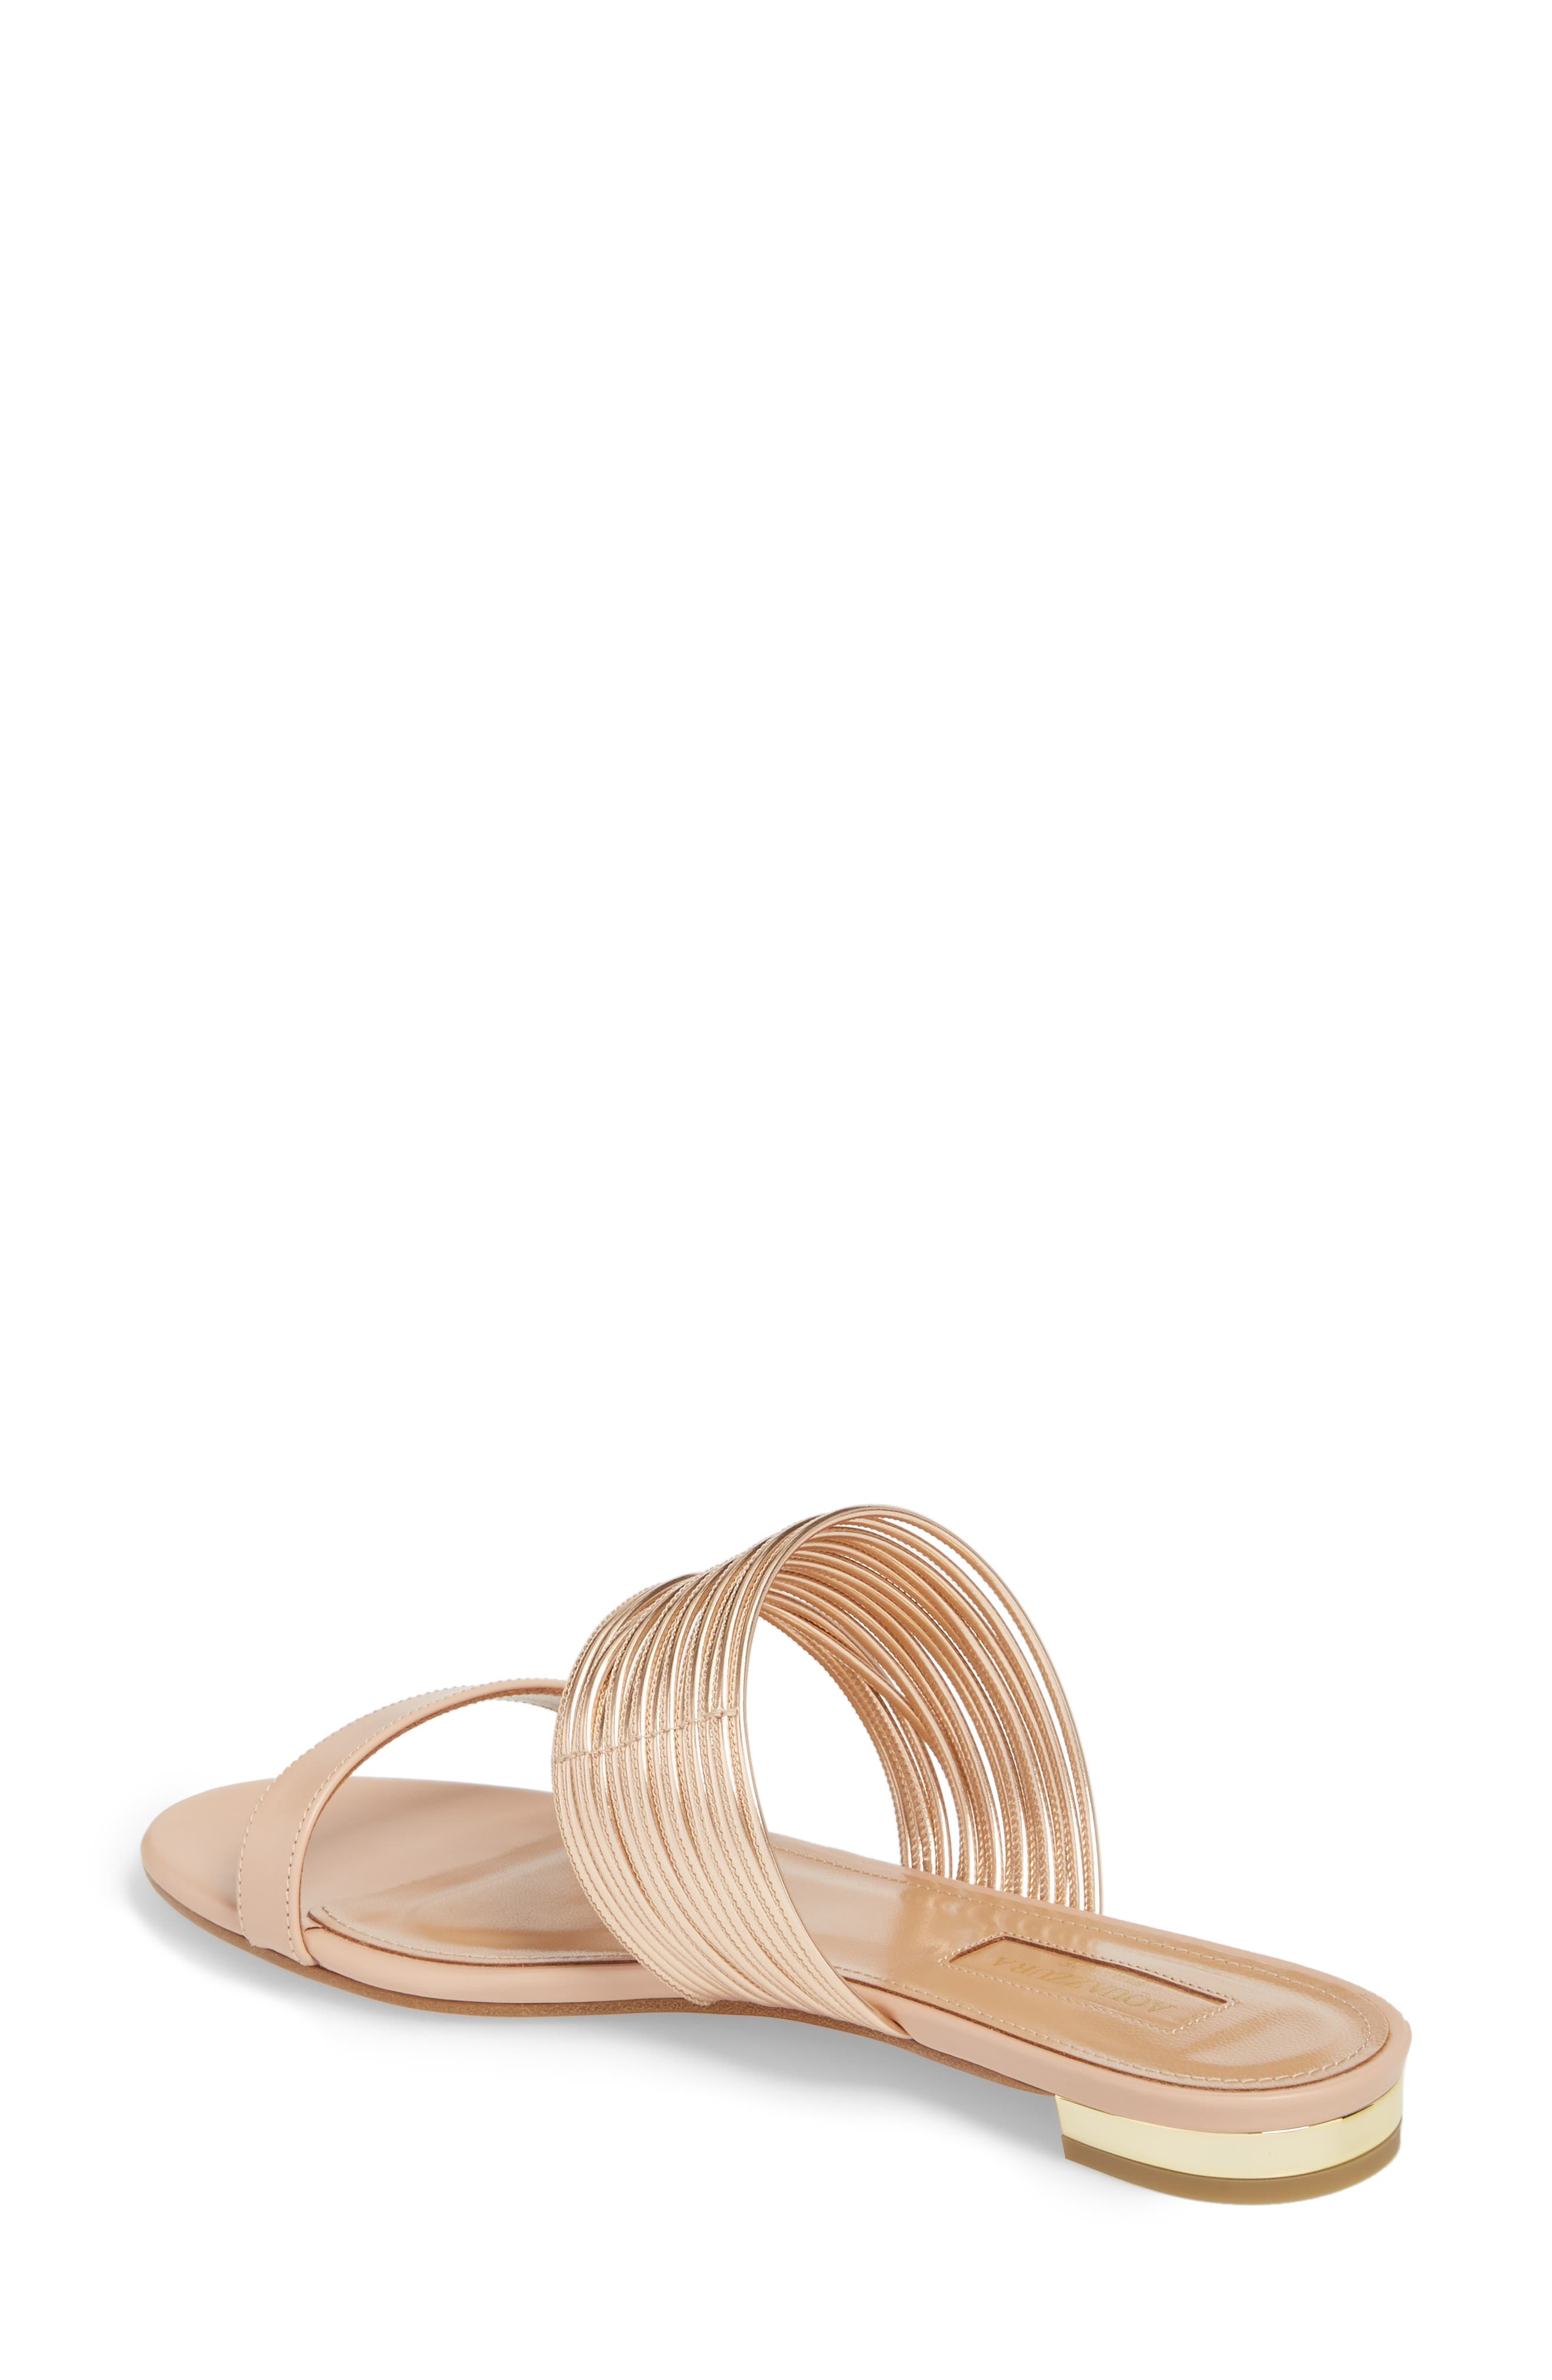 Rendezvous Metallic Sandal,                             Alternate thumbnail 2, color,                             POWDER PINK/CIPRIA